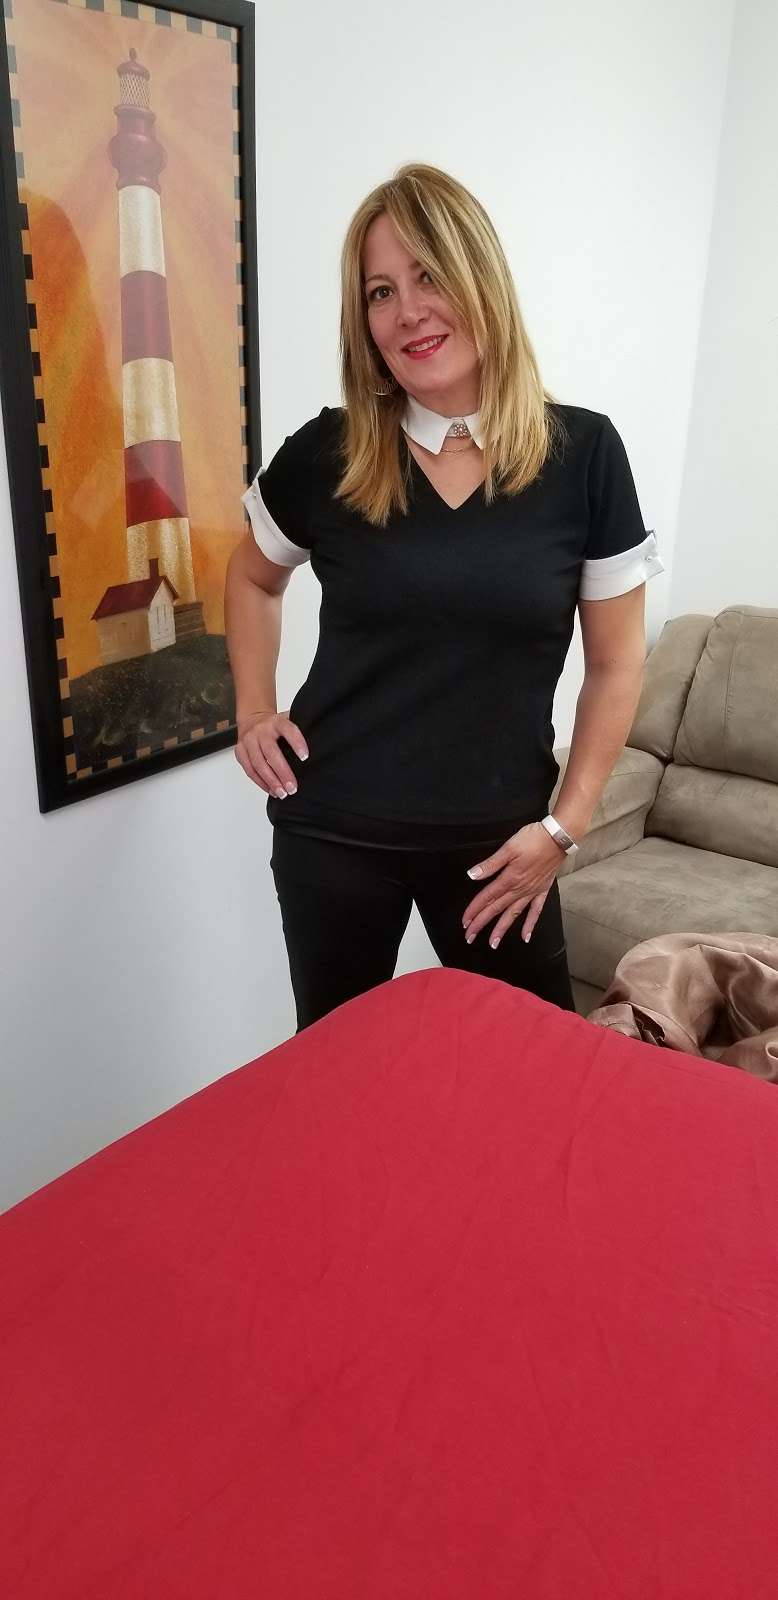 A Lovely Massage - spa  | Photo 4 of 5 | Address: 230 S Cypress Rd H, Pompano Beach, FL 33060, USA | Phone: (754) 307-2255